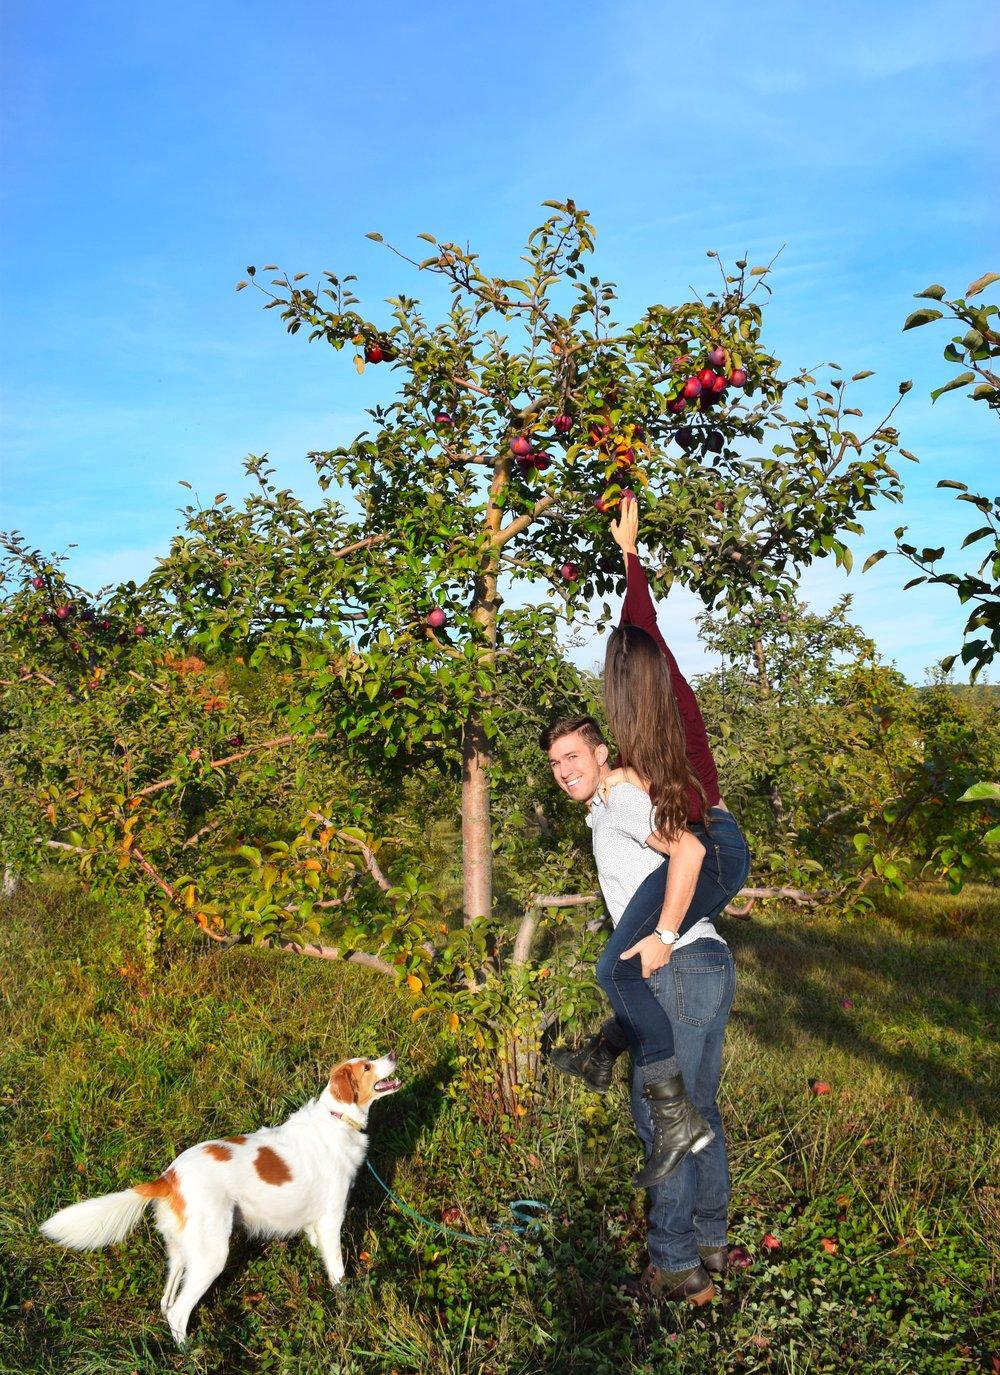 adule-apple-picking-orchard.JPG